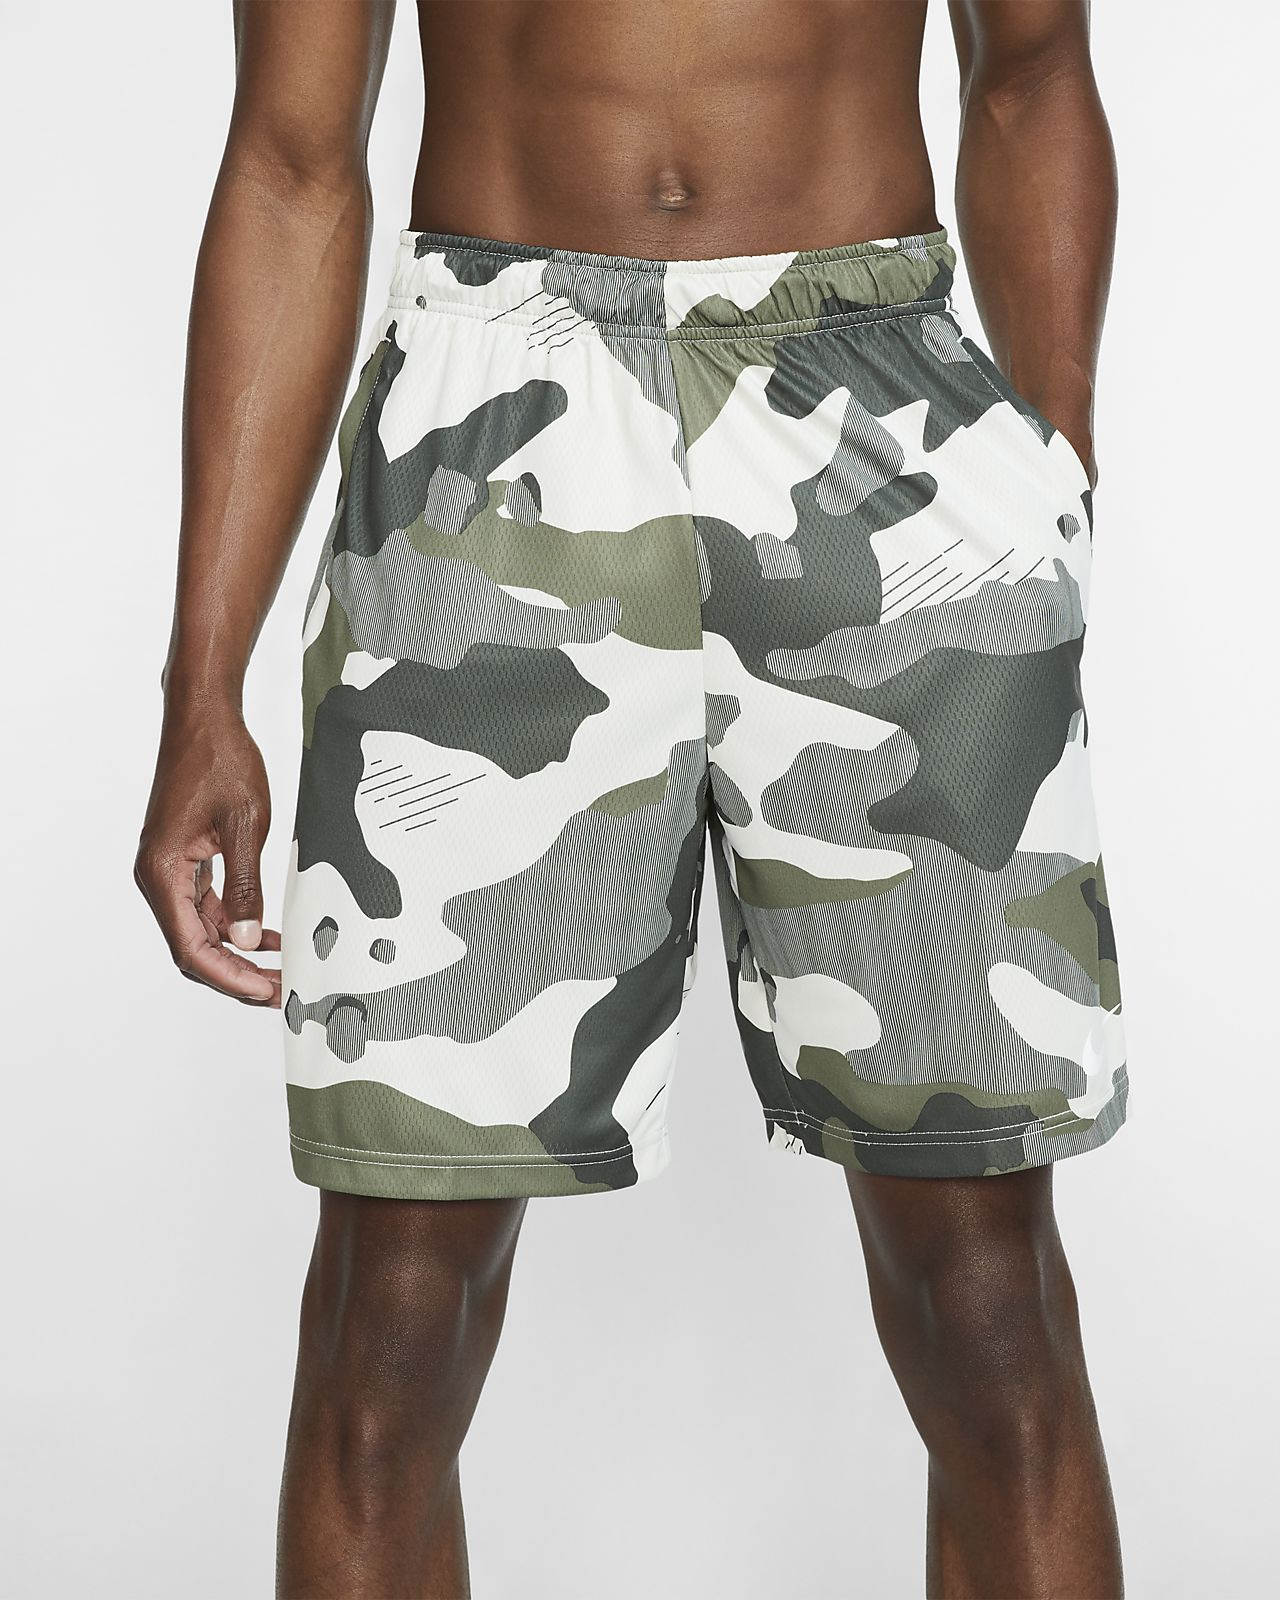 Męskie spodenki treningowe moro Nike Dri-FIT